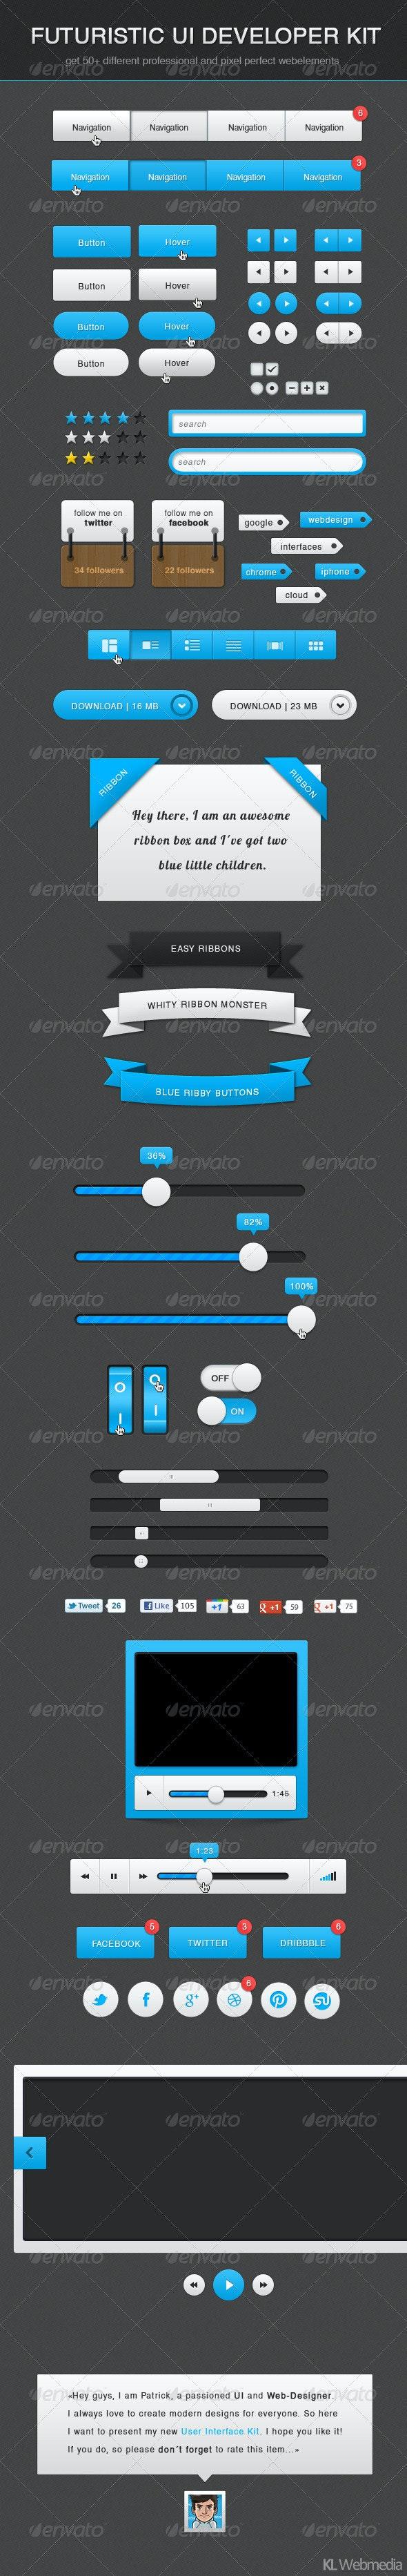 Futuristic Developer UI Kit